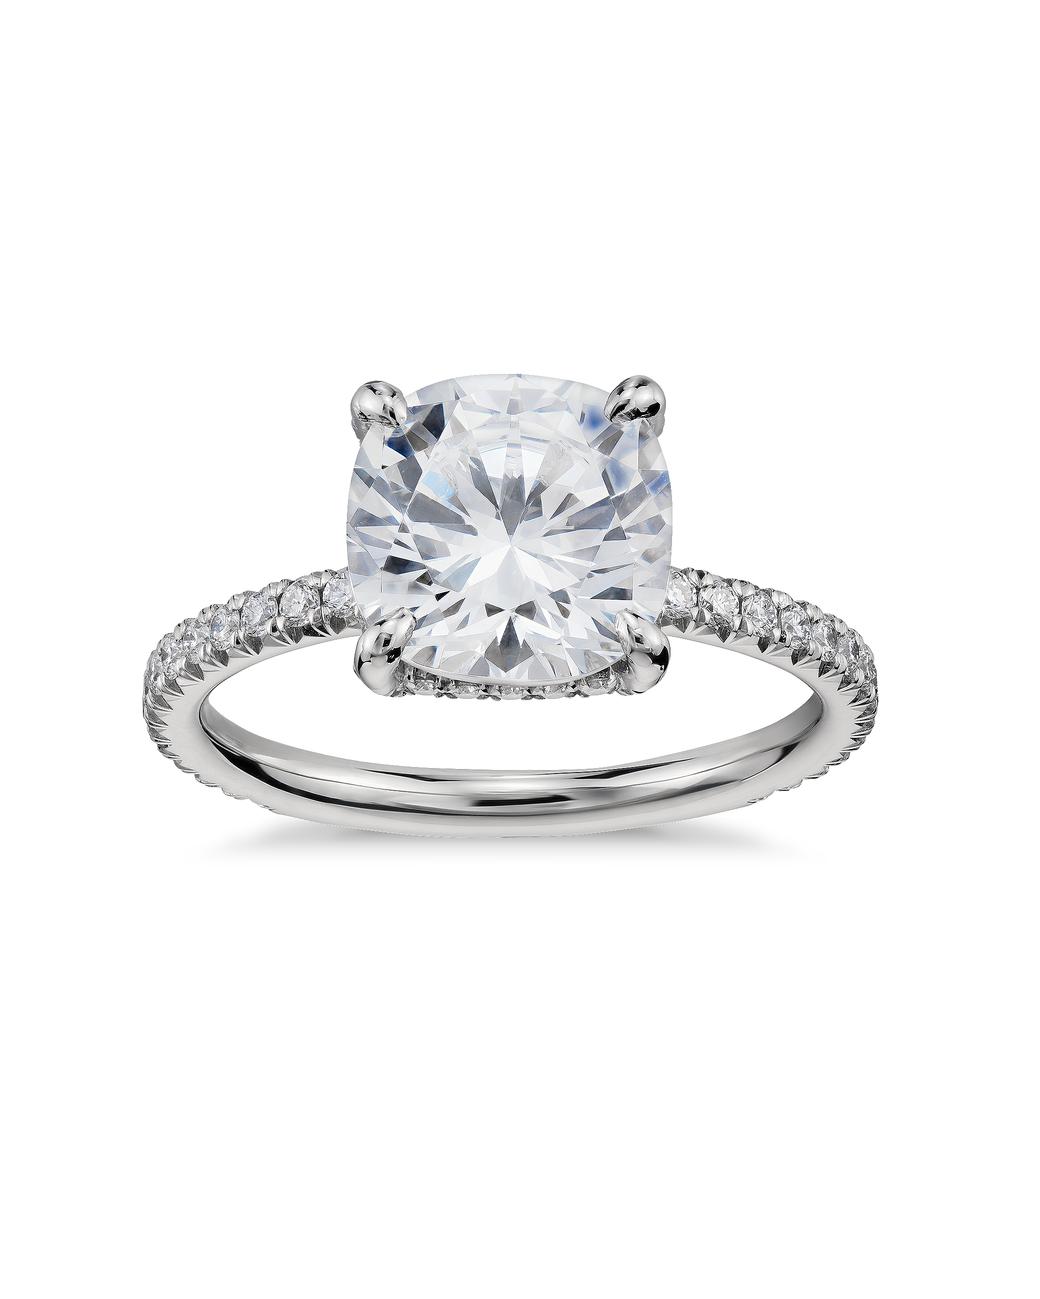 Cushion-Cut Diamond Engagement Rings | Martha Stewart Weddings